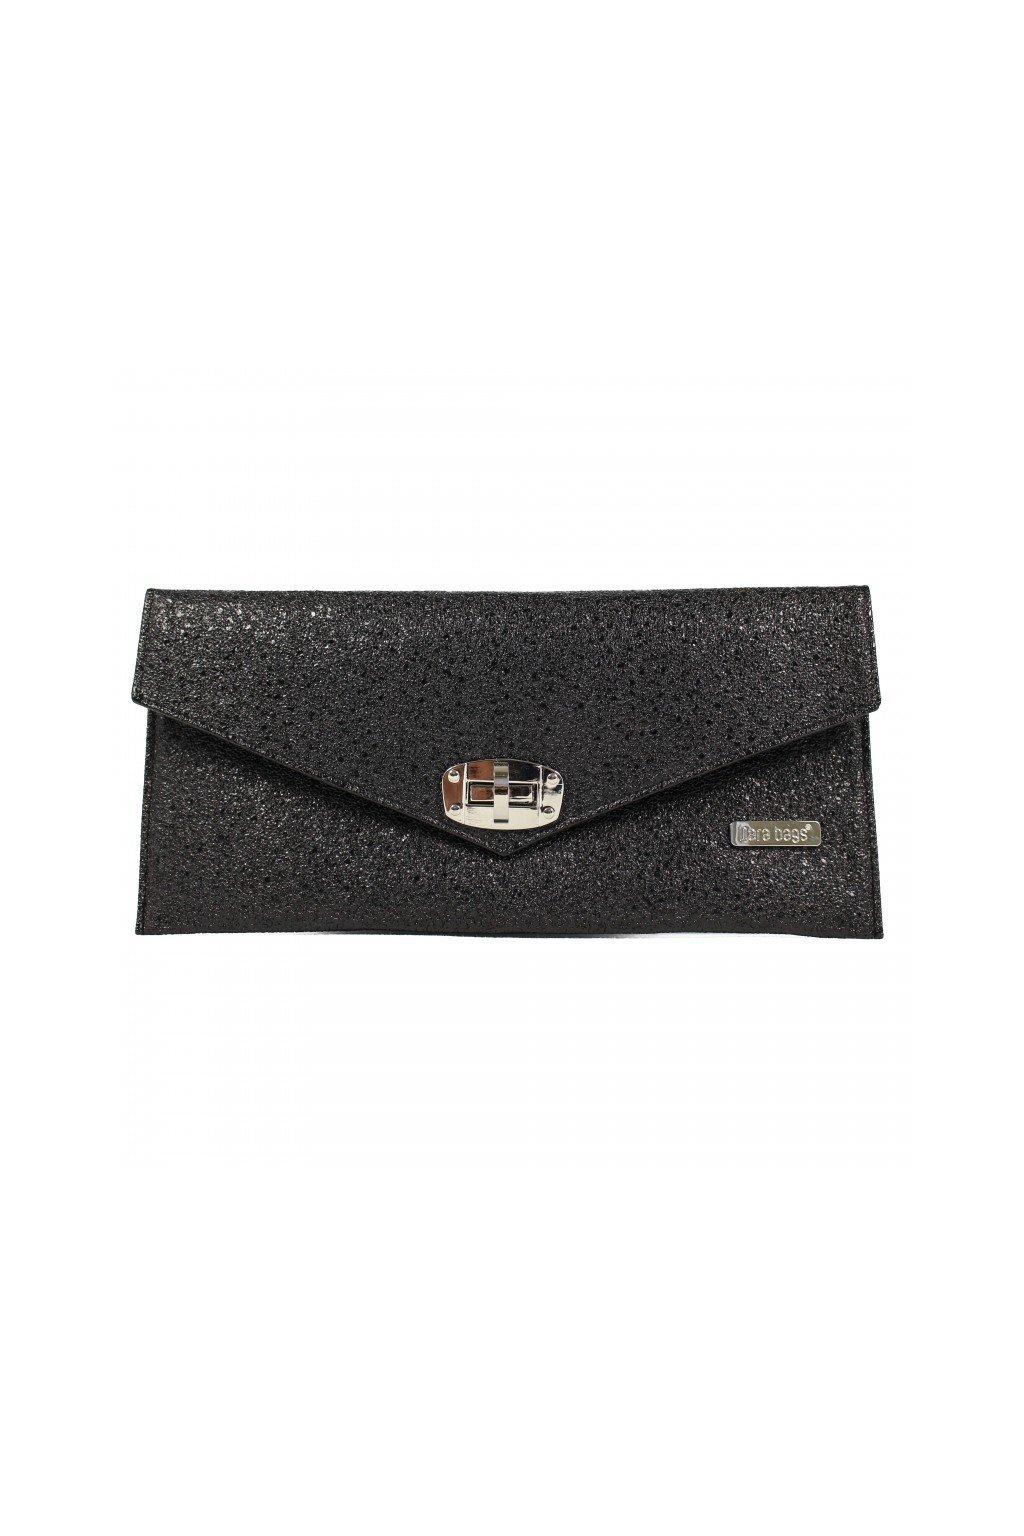 Malá třpytivá kabelka Malibu Classy Dara bags černá 1